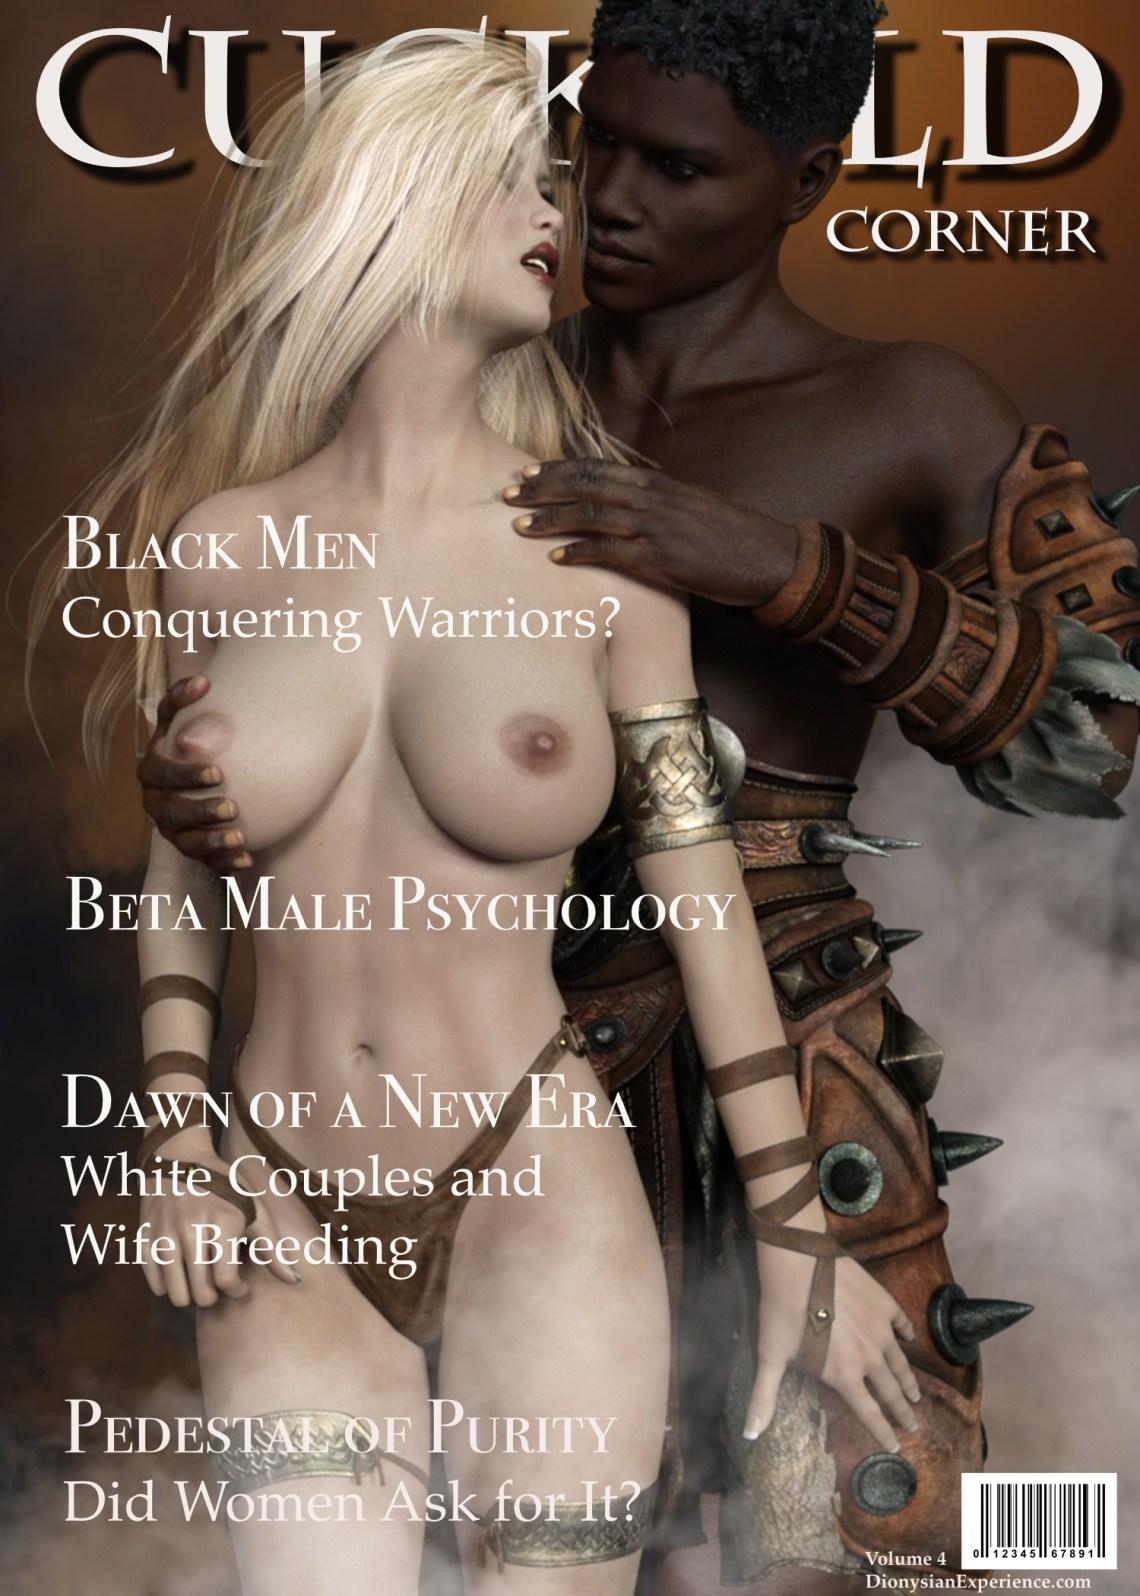 Cuckold Corner Vol 4